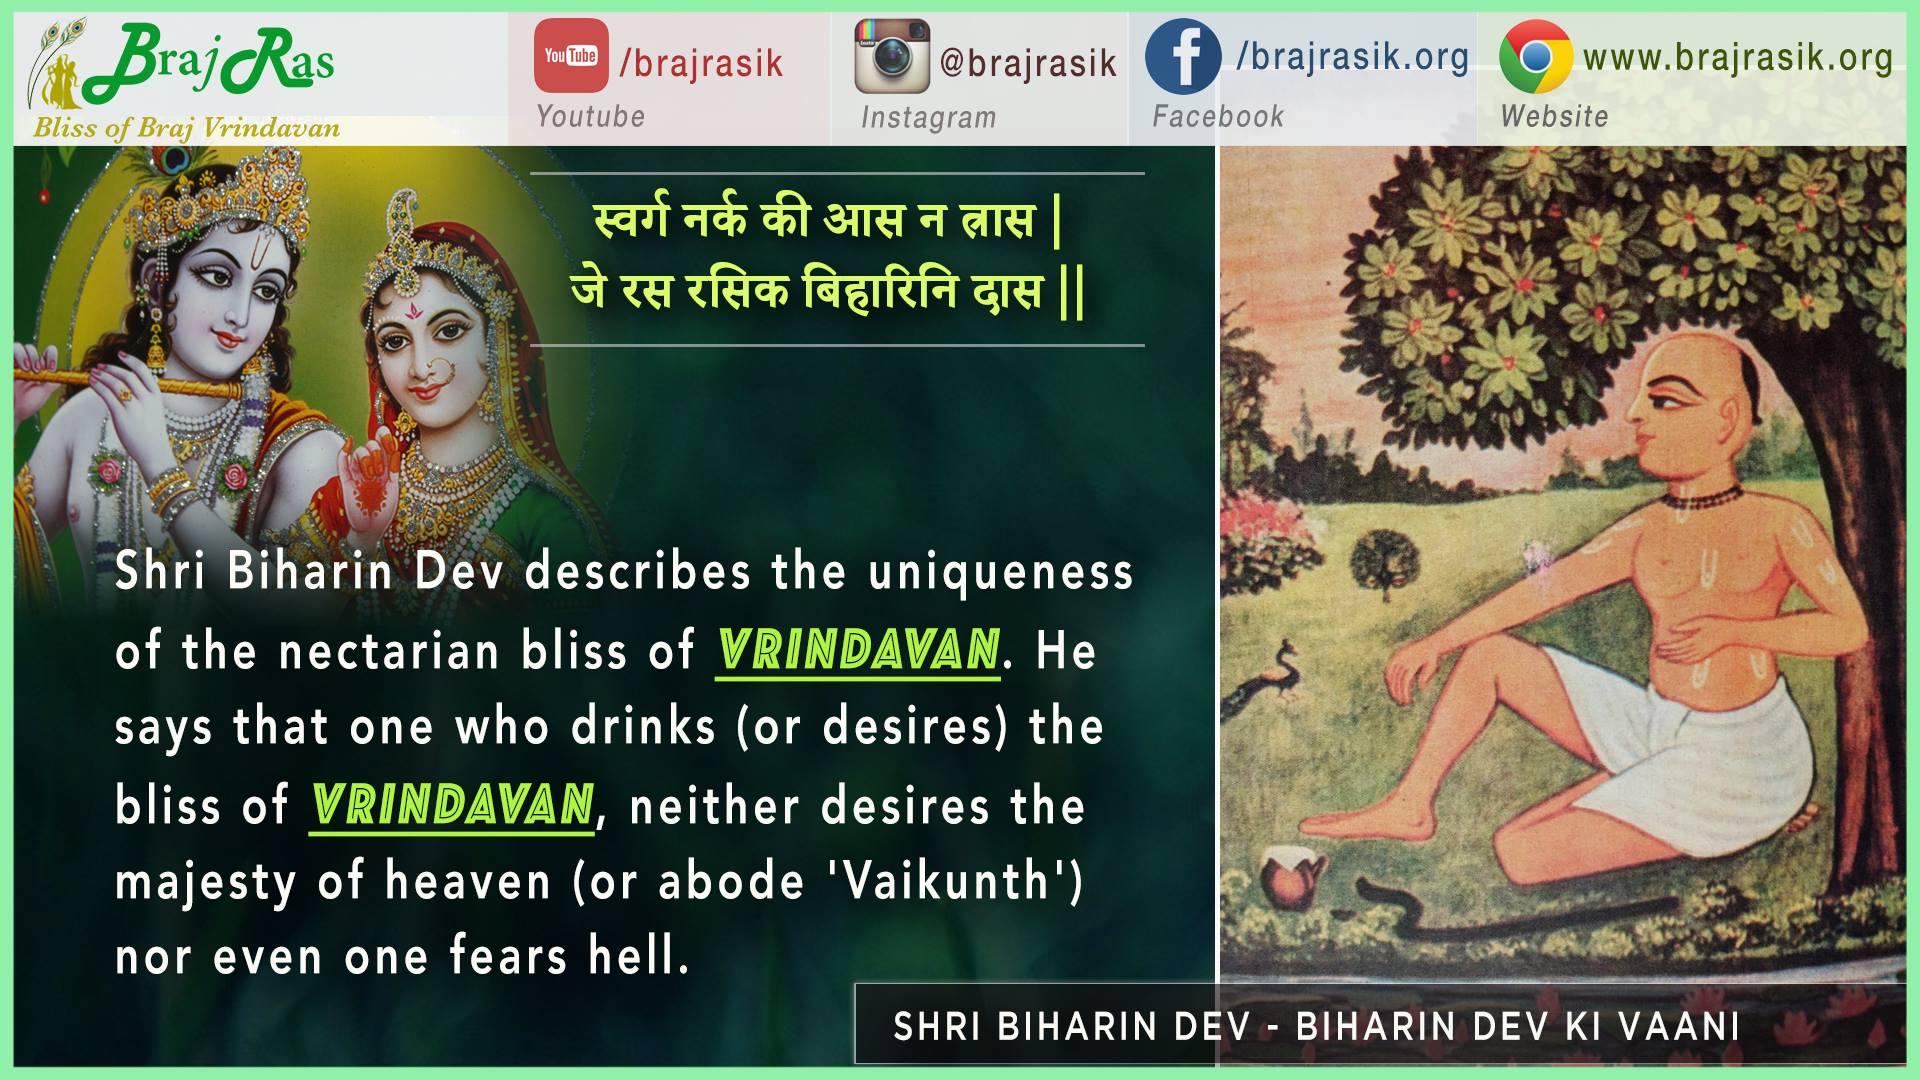 Swarg Nark Ki Aas Na Traas - Shri Biharin Dev - Biharin Dev Ji Ki Vaani